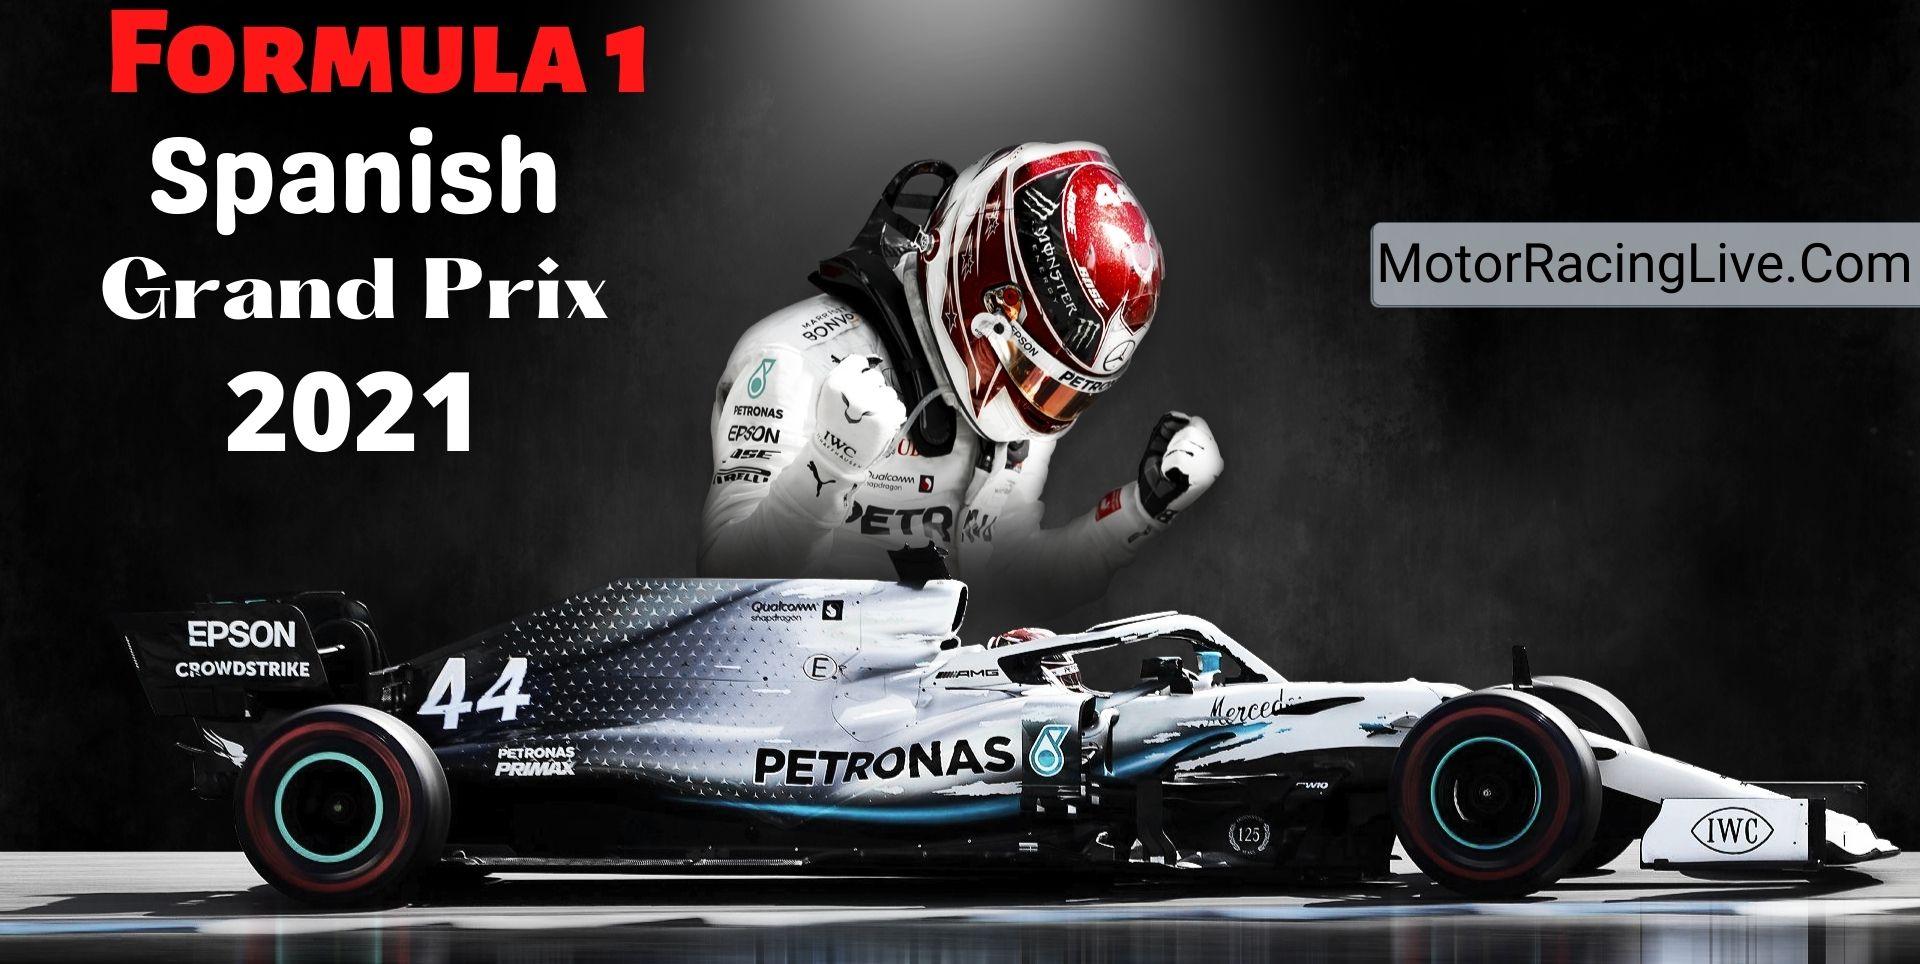 Spanish F1 Grand Prix Live Streaming 2021 | Full Race Replay